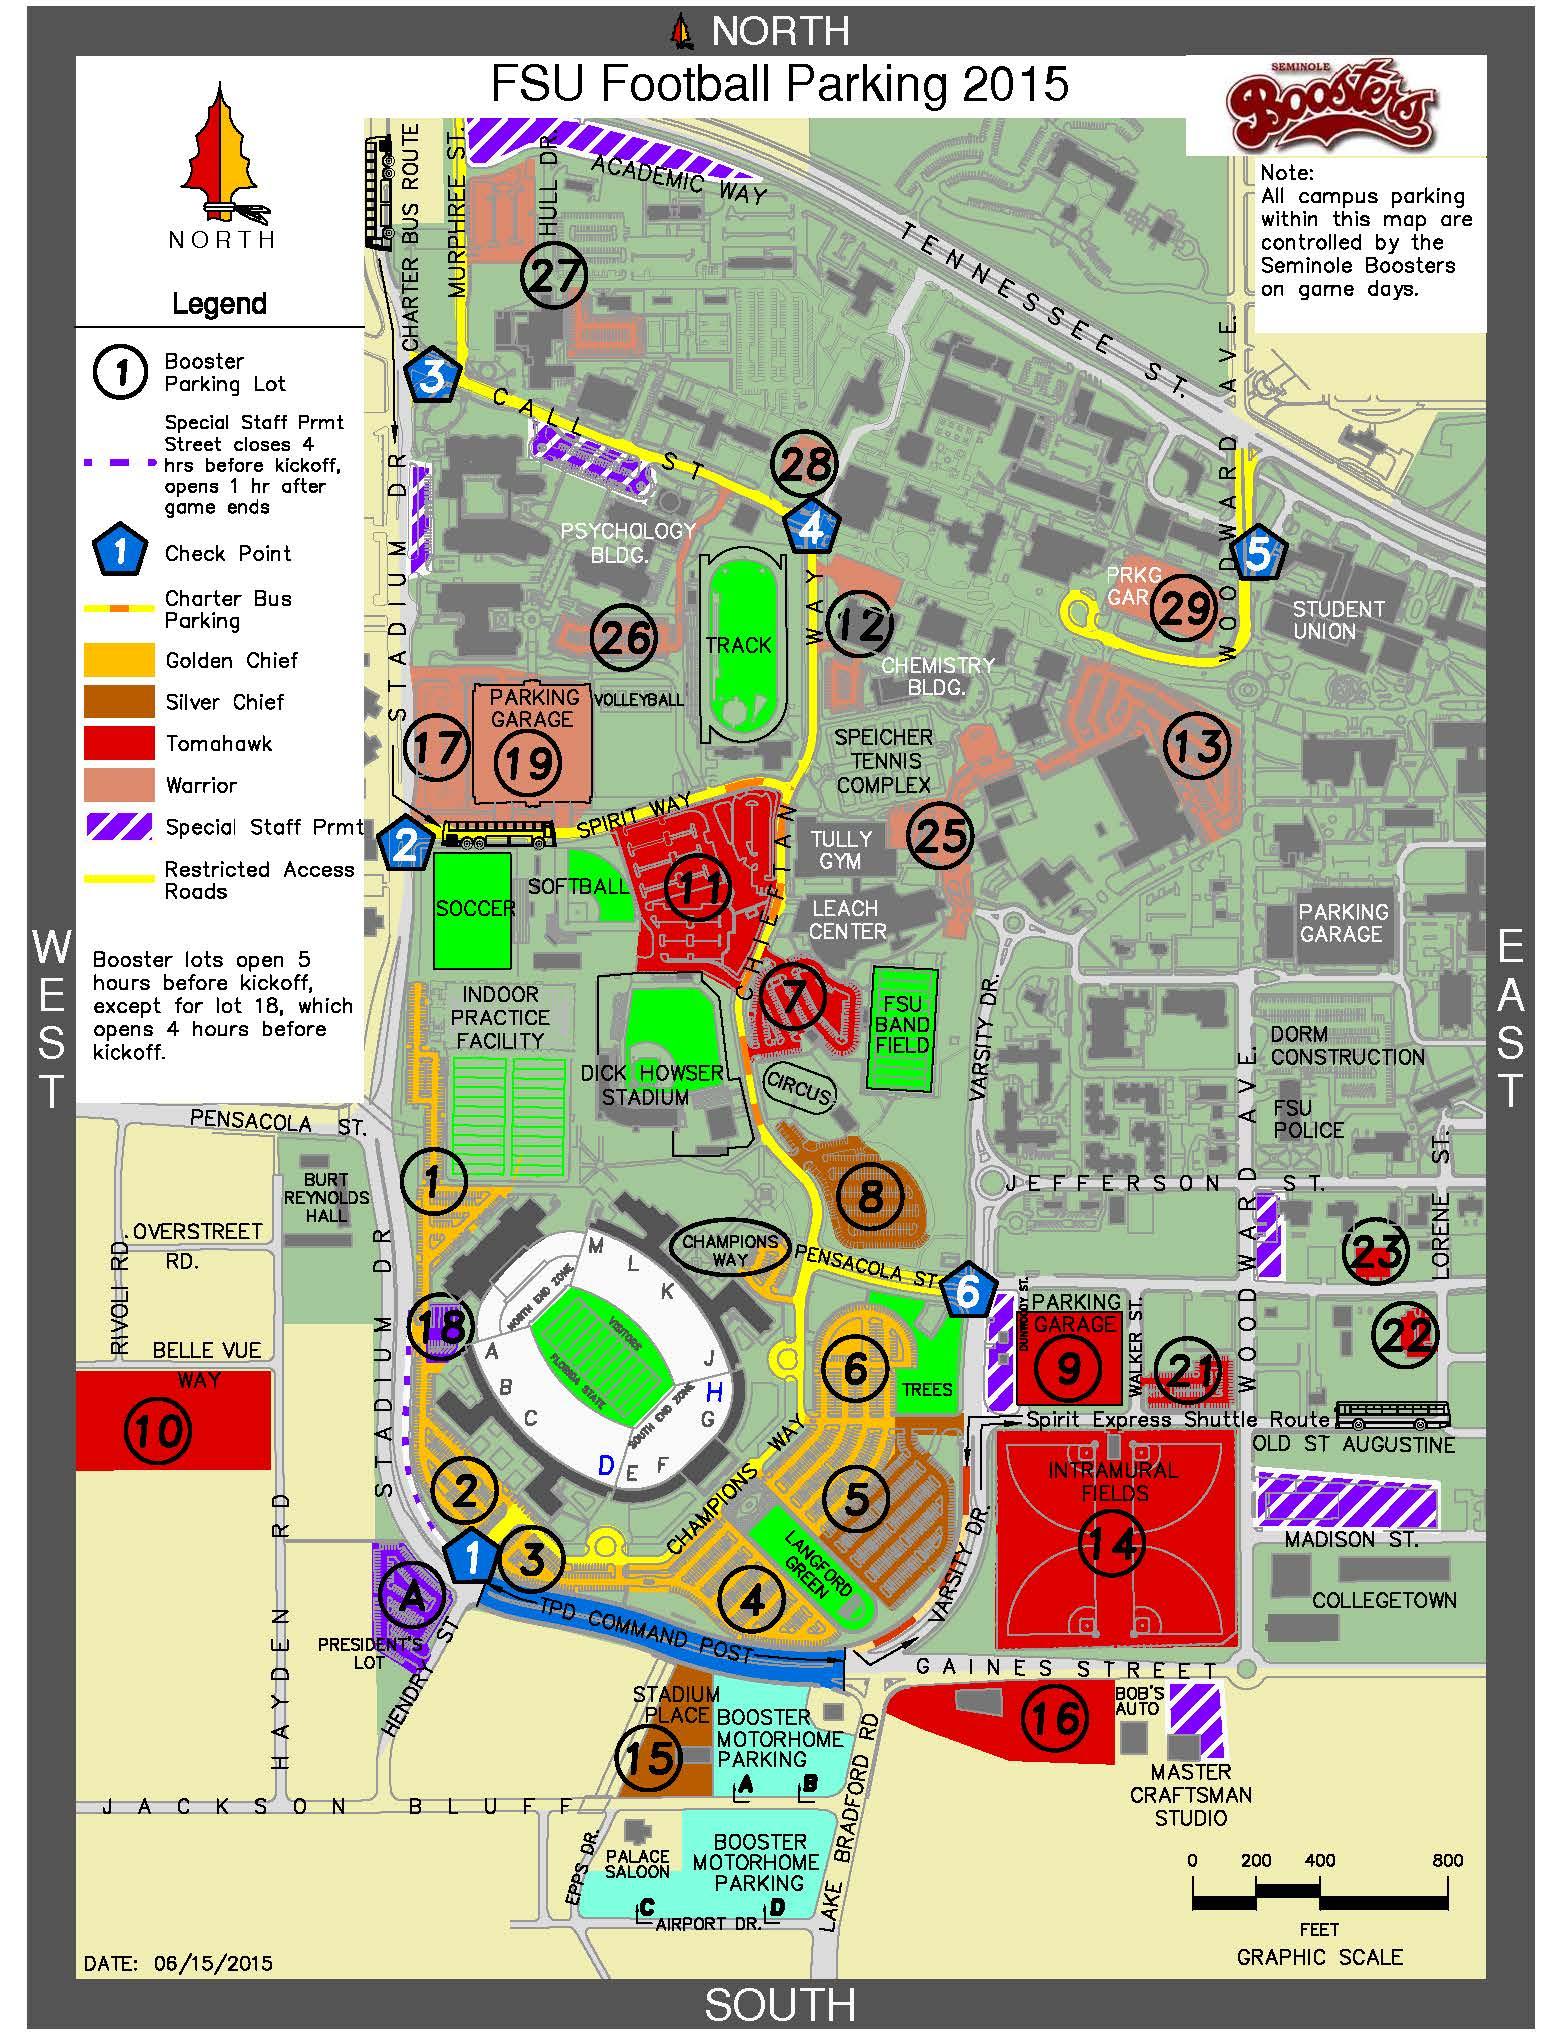 Doak Campbell Stadium Seating & Parking   Tallahassee Seminole Club - University Of Florida Football Stadium Map